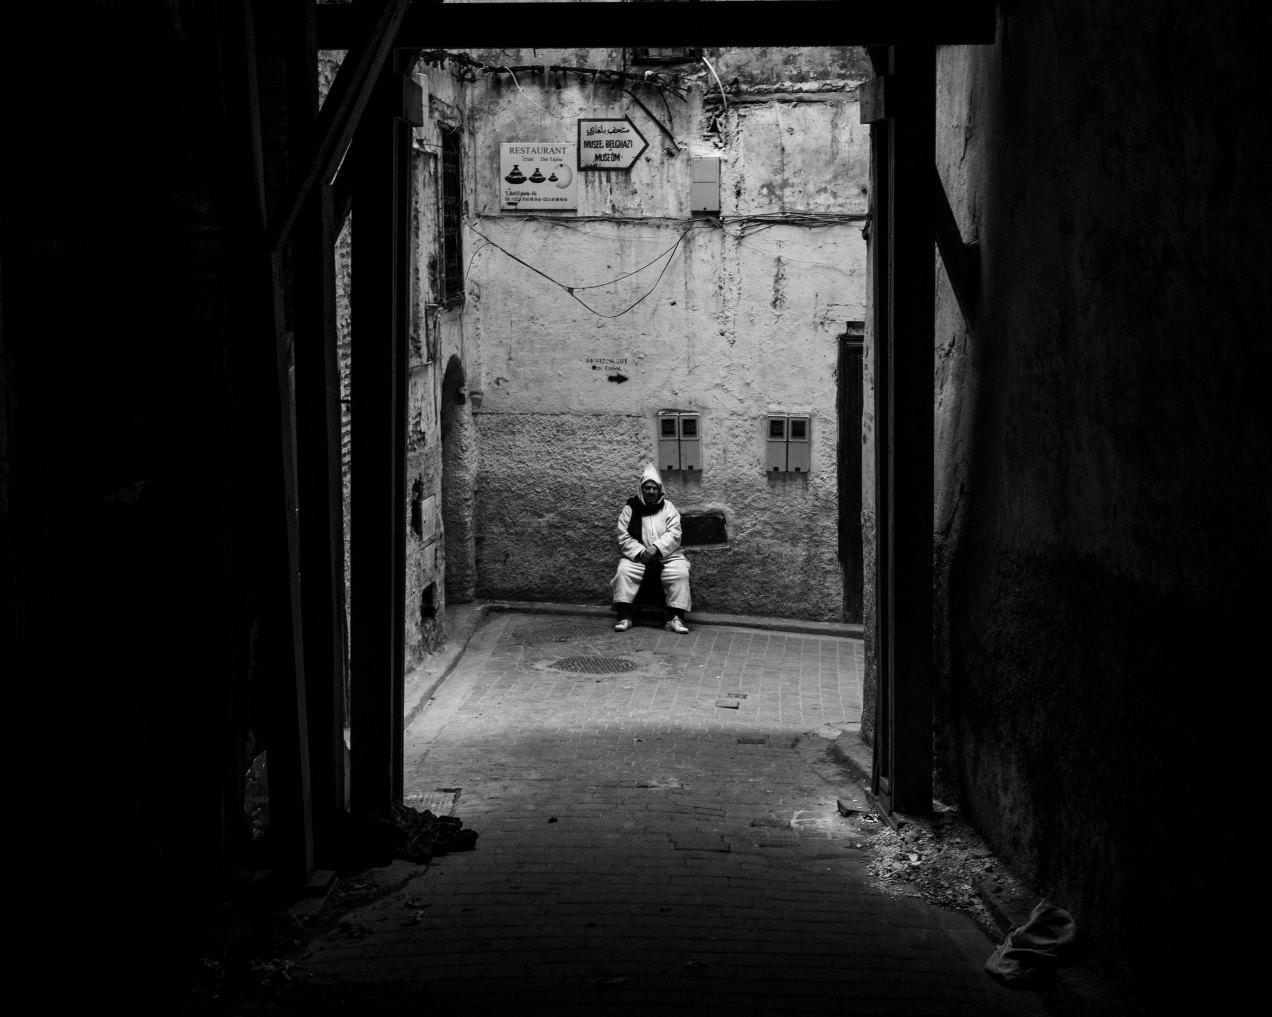 Pause en burnou, Fès, Médina, Maroc, gildalliere, 2020